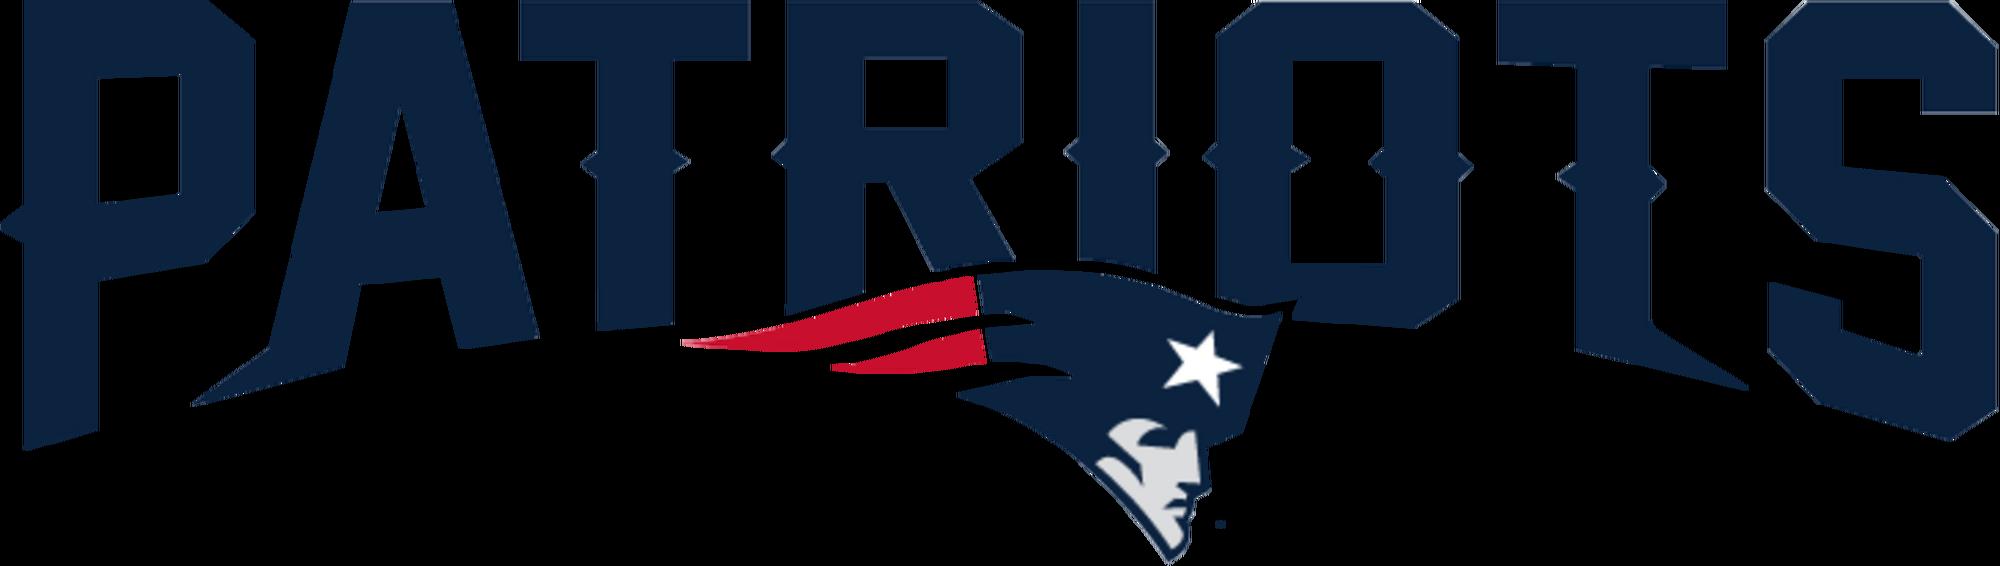 New England Patriots American Football Wiki Fandom Powered By Wikia